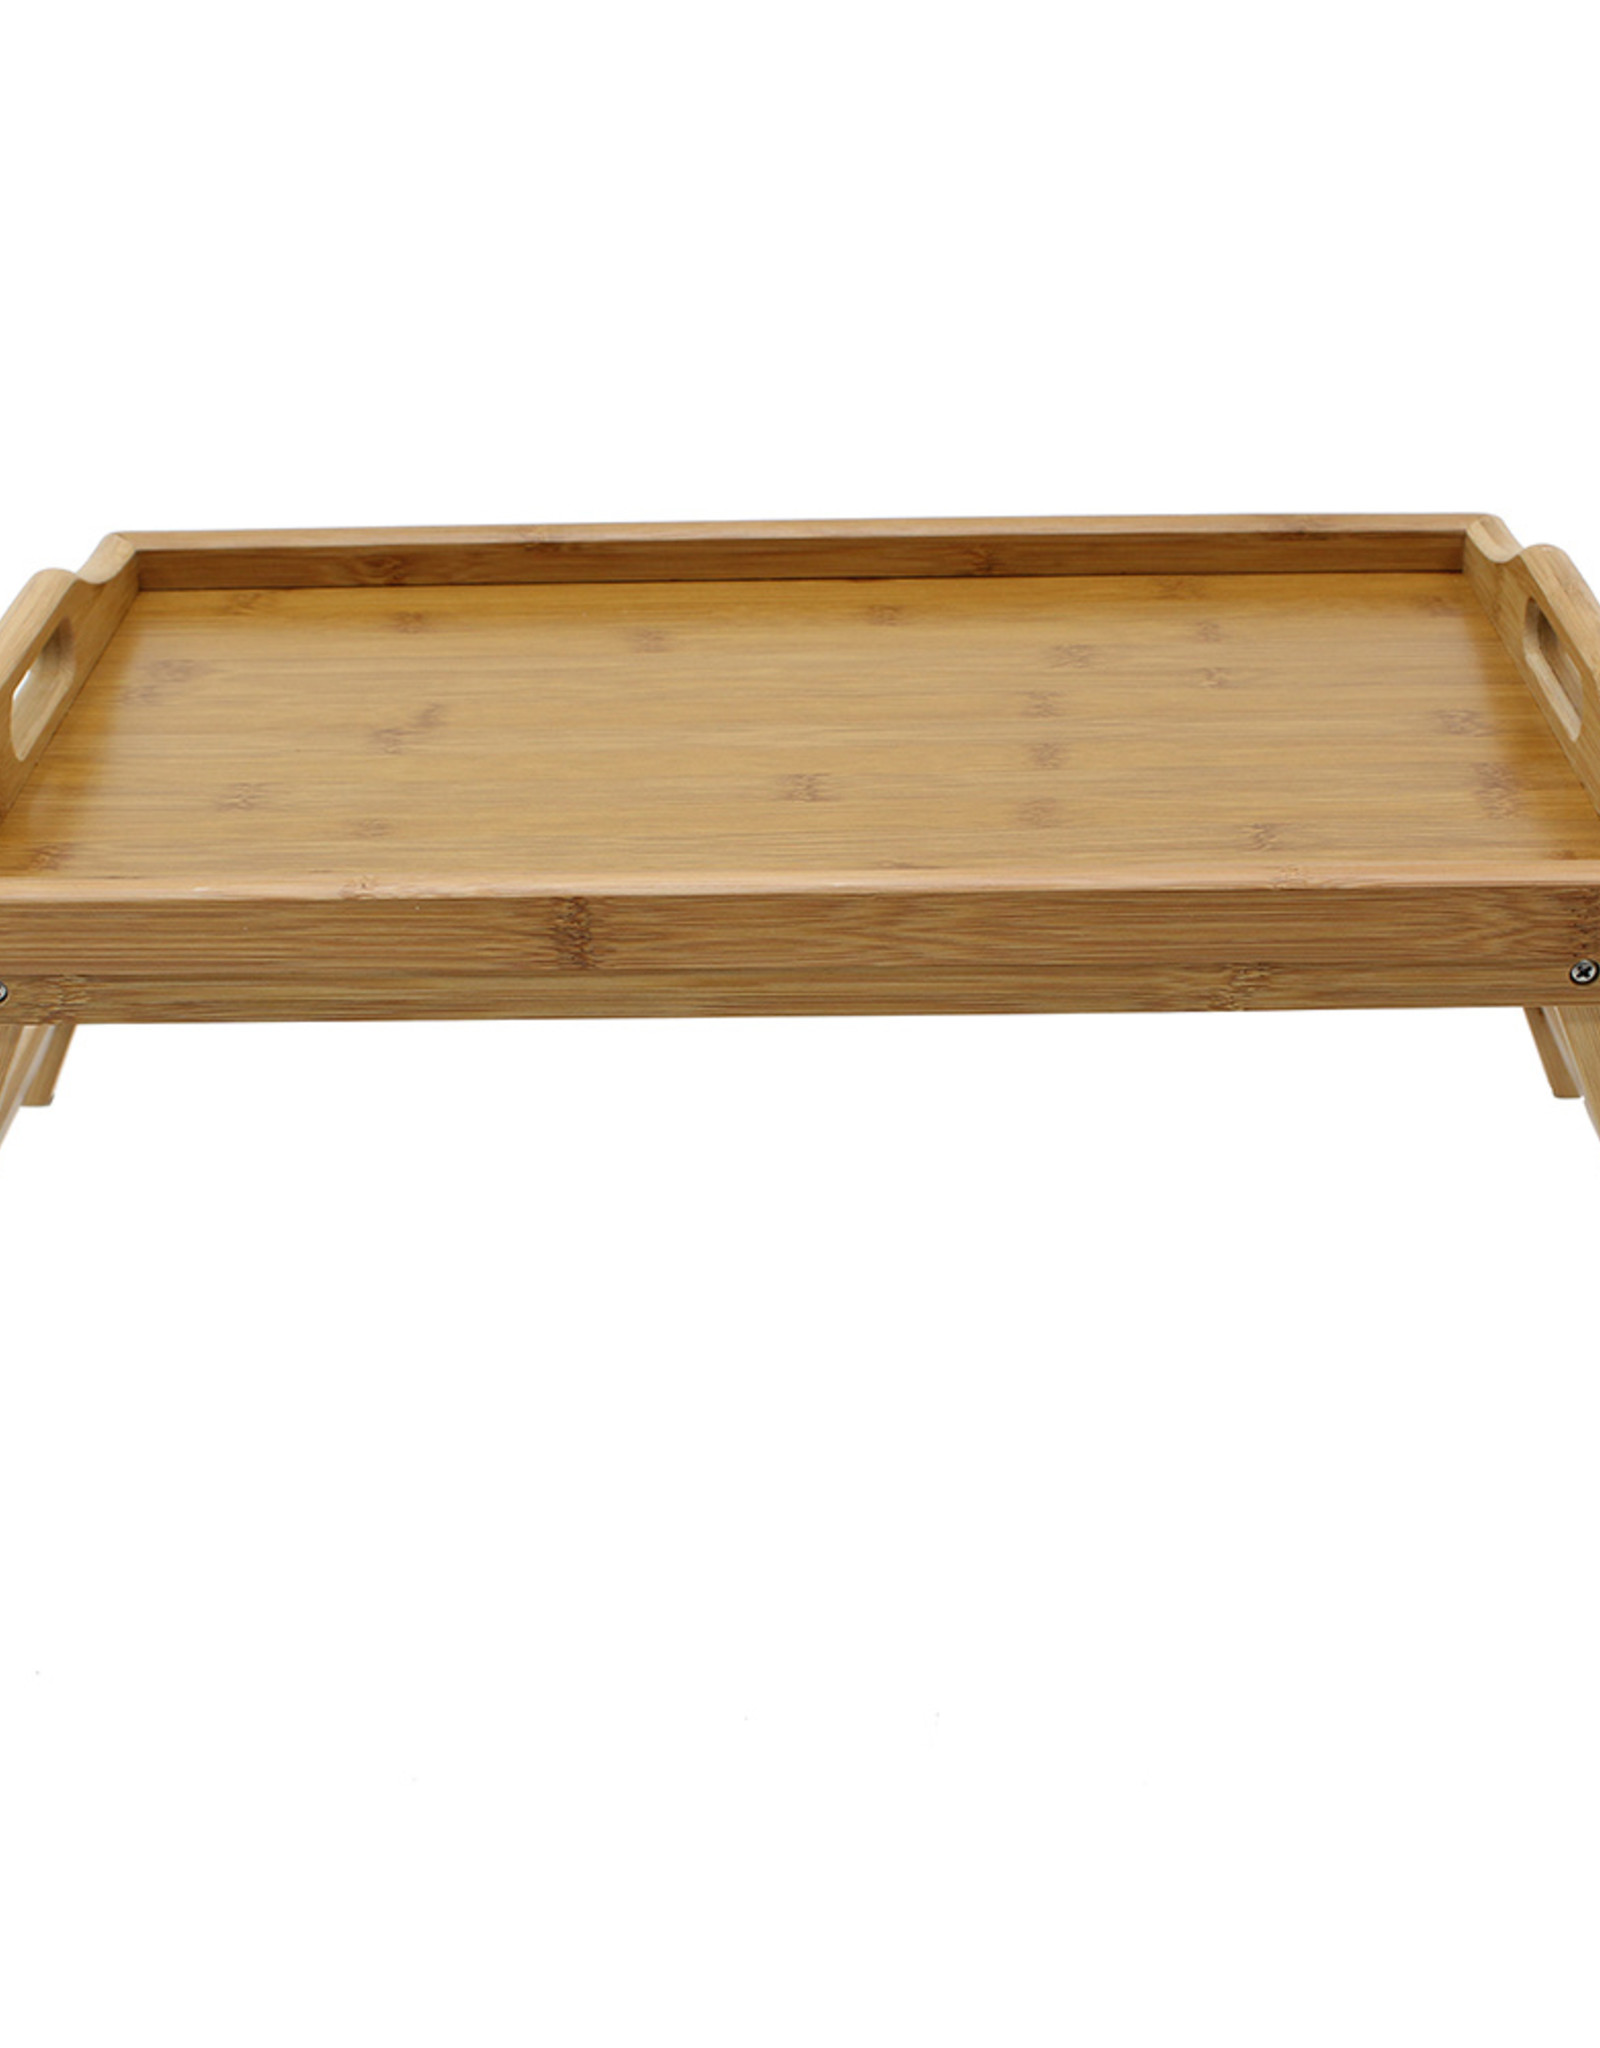 Cathay Basket Cathay Tray Fold Bed Bamboo 23-0127